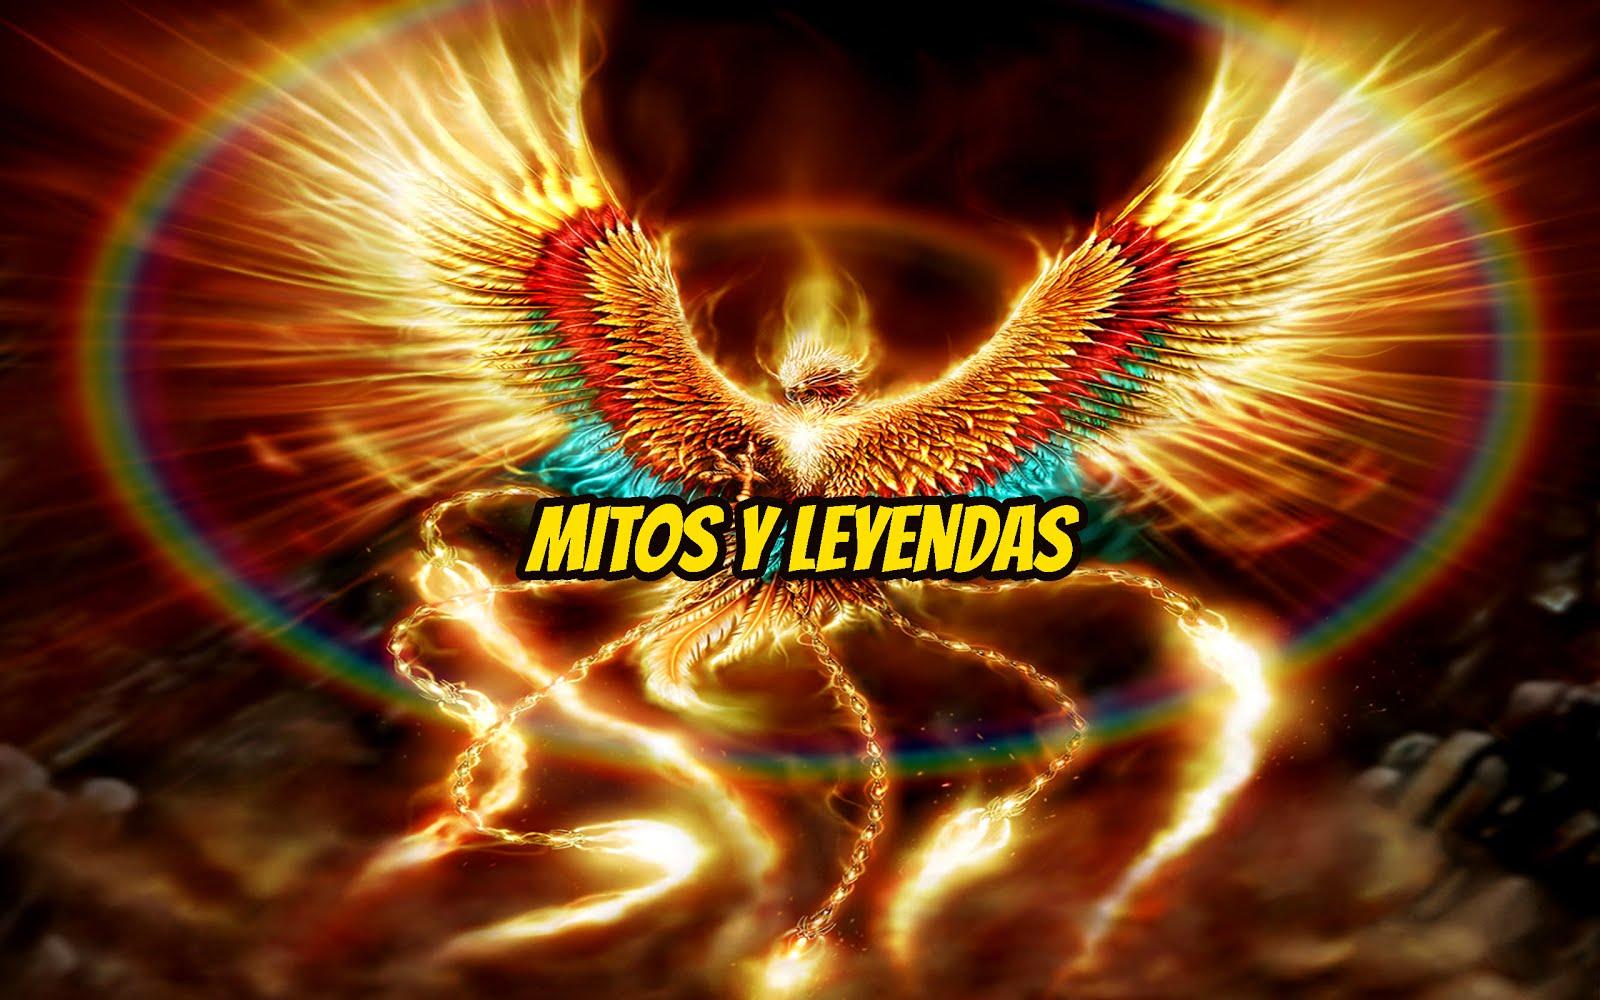 CANAL: MITOS Y LEYENDAS.